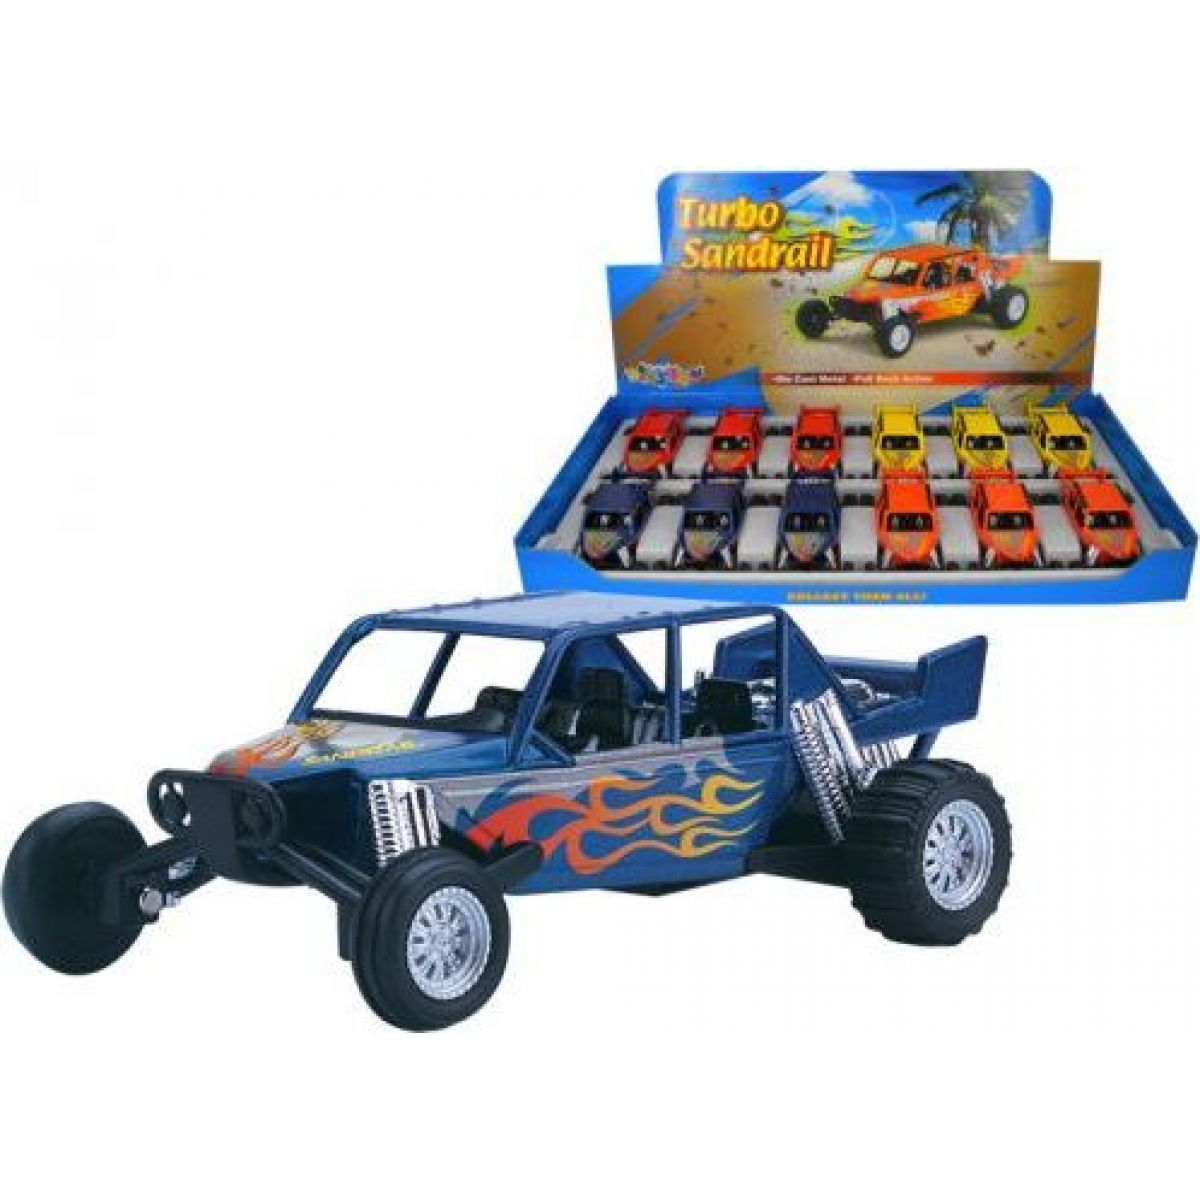 HM Studio Buggy turbo